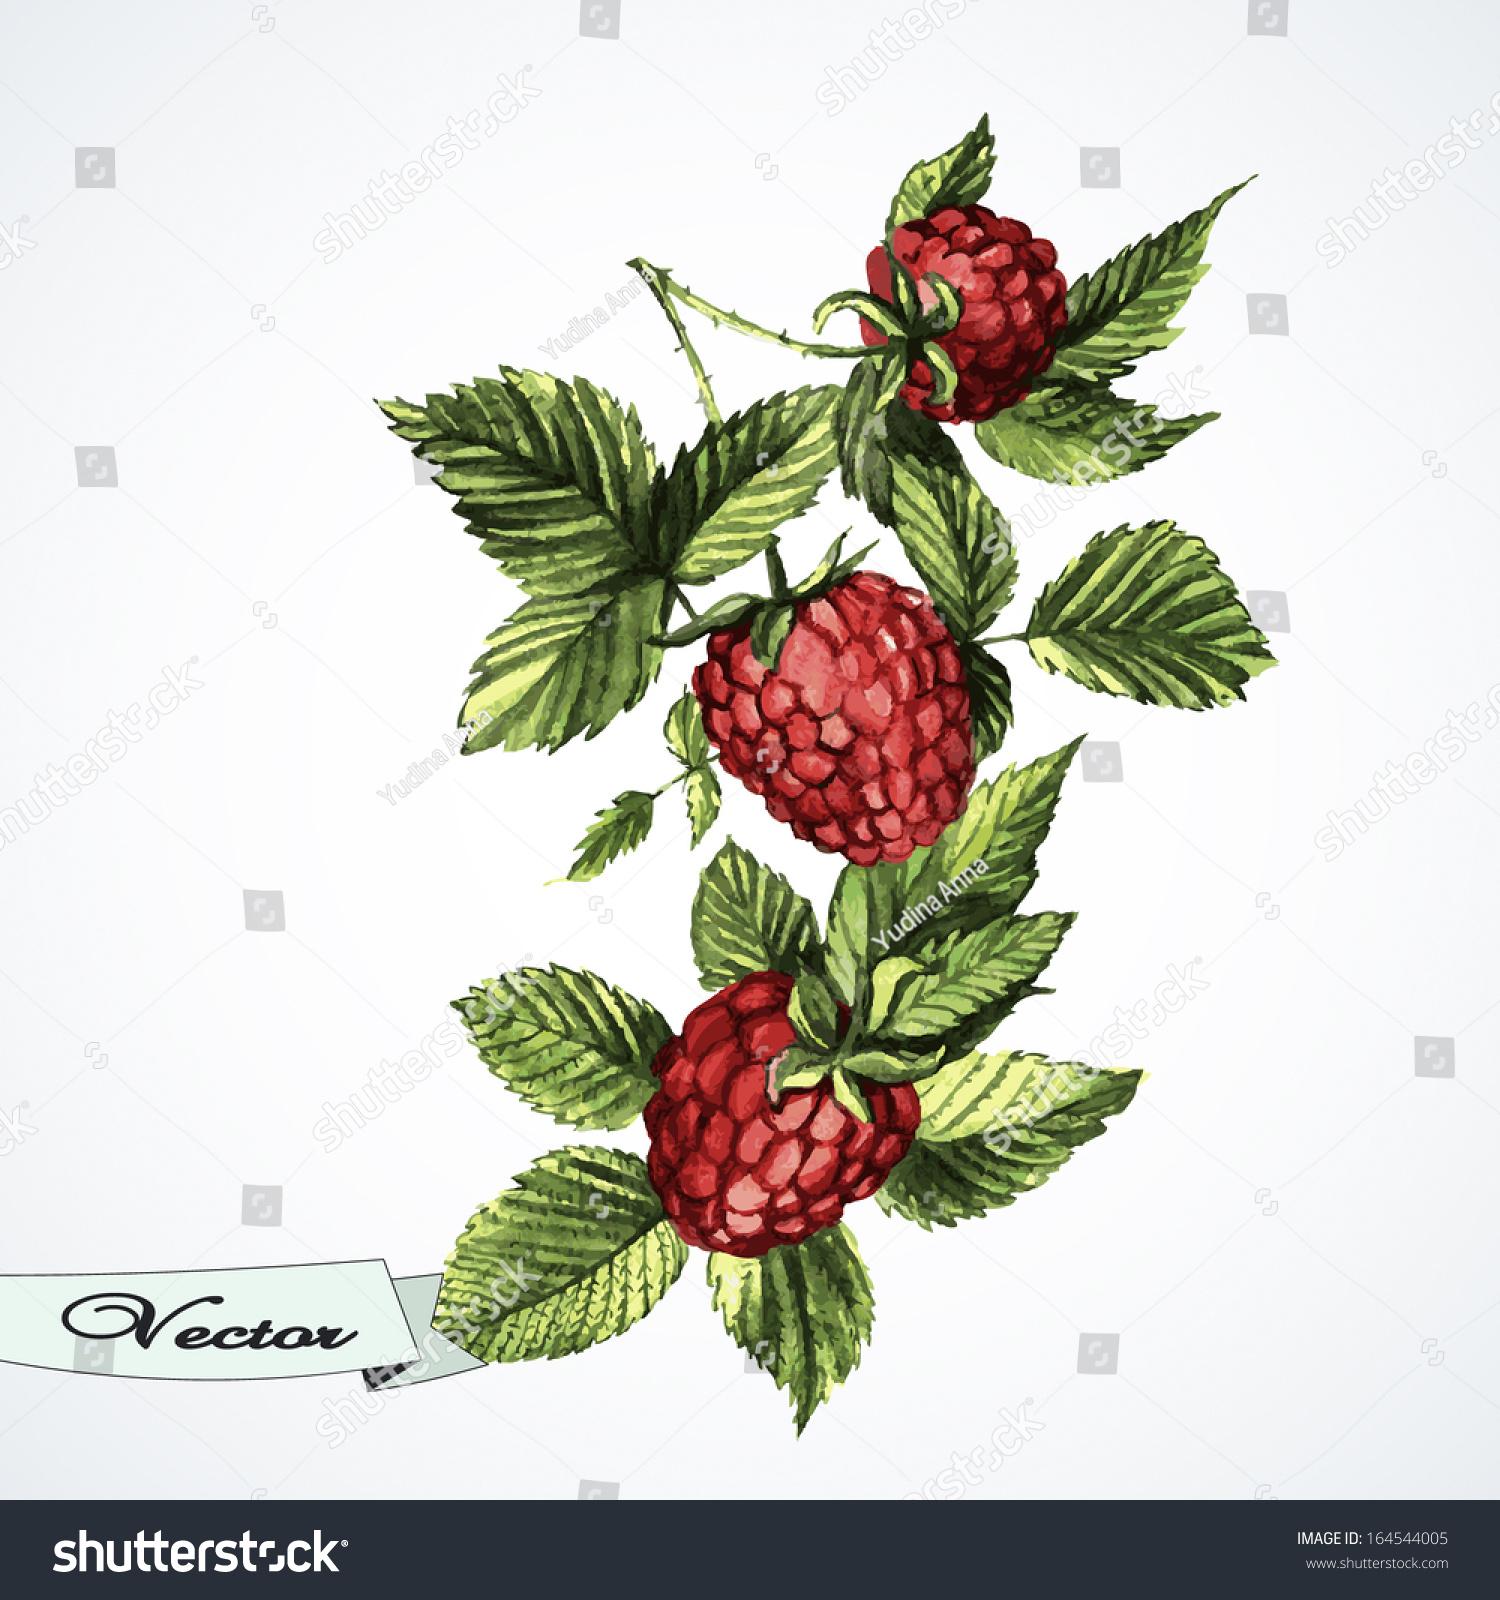 Vector Watercolor Raspberries Illustration Greeting Cards Stock